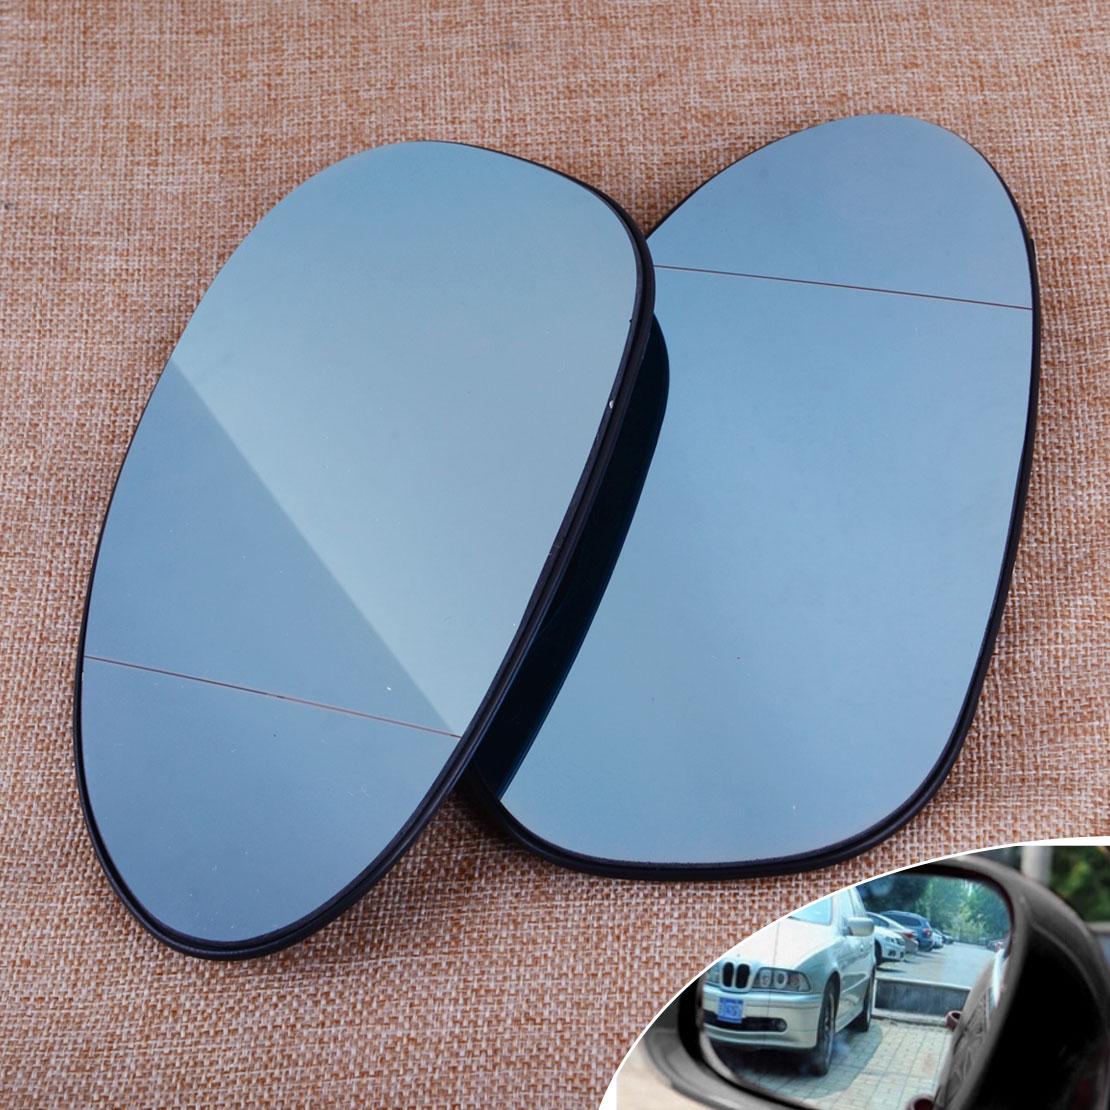 CITALL Blue Left&Right Heated Wing Door Mirror Fit for BMW E82 E85 E86 Z4 Roadster Coupe E88 E90 E91 E92 E93 1 3 Series 2008 цена 2017